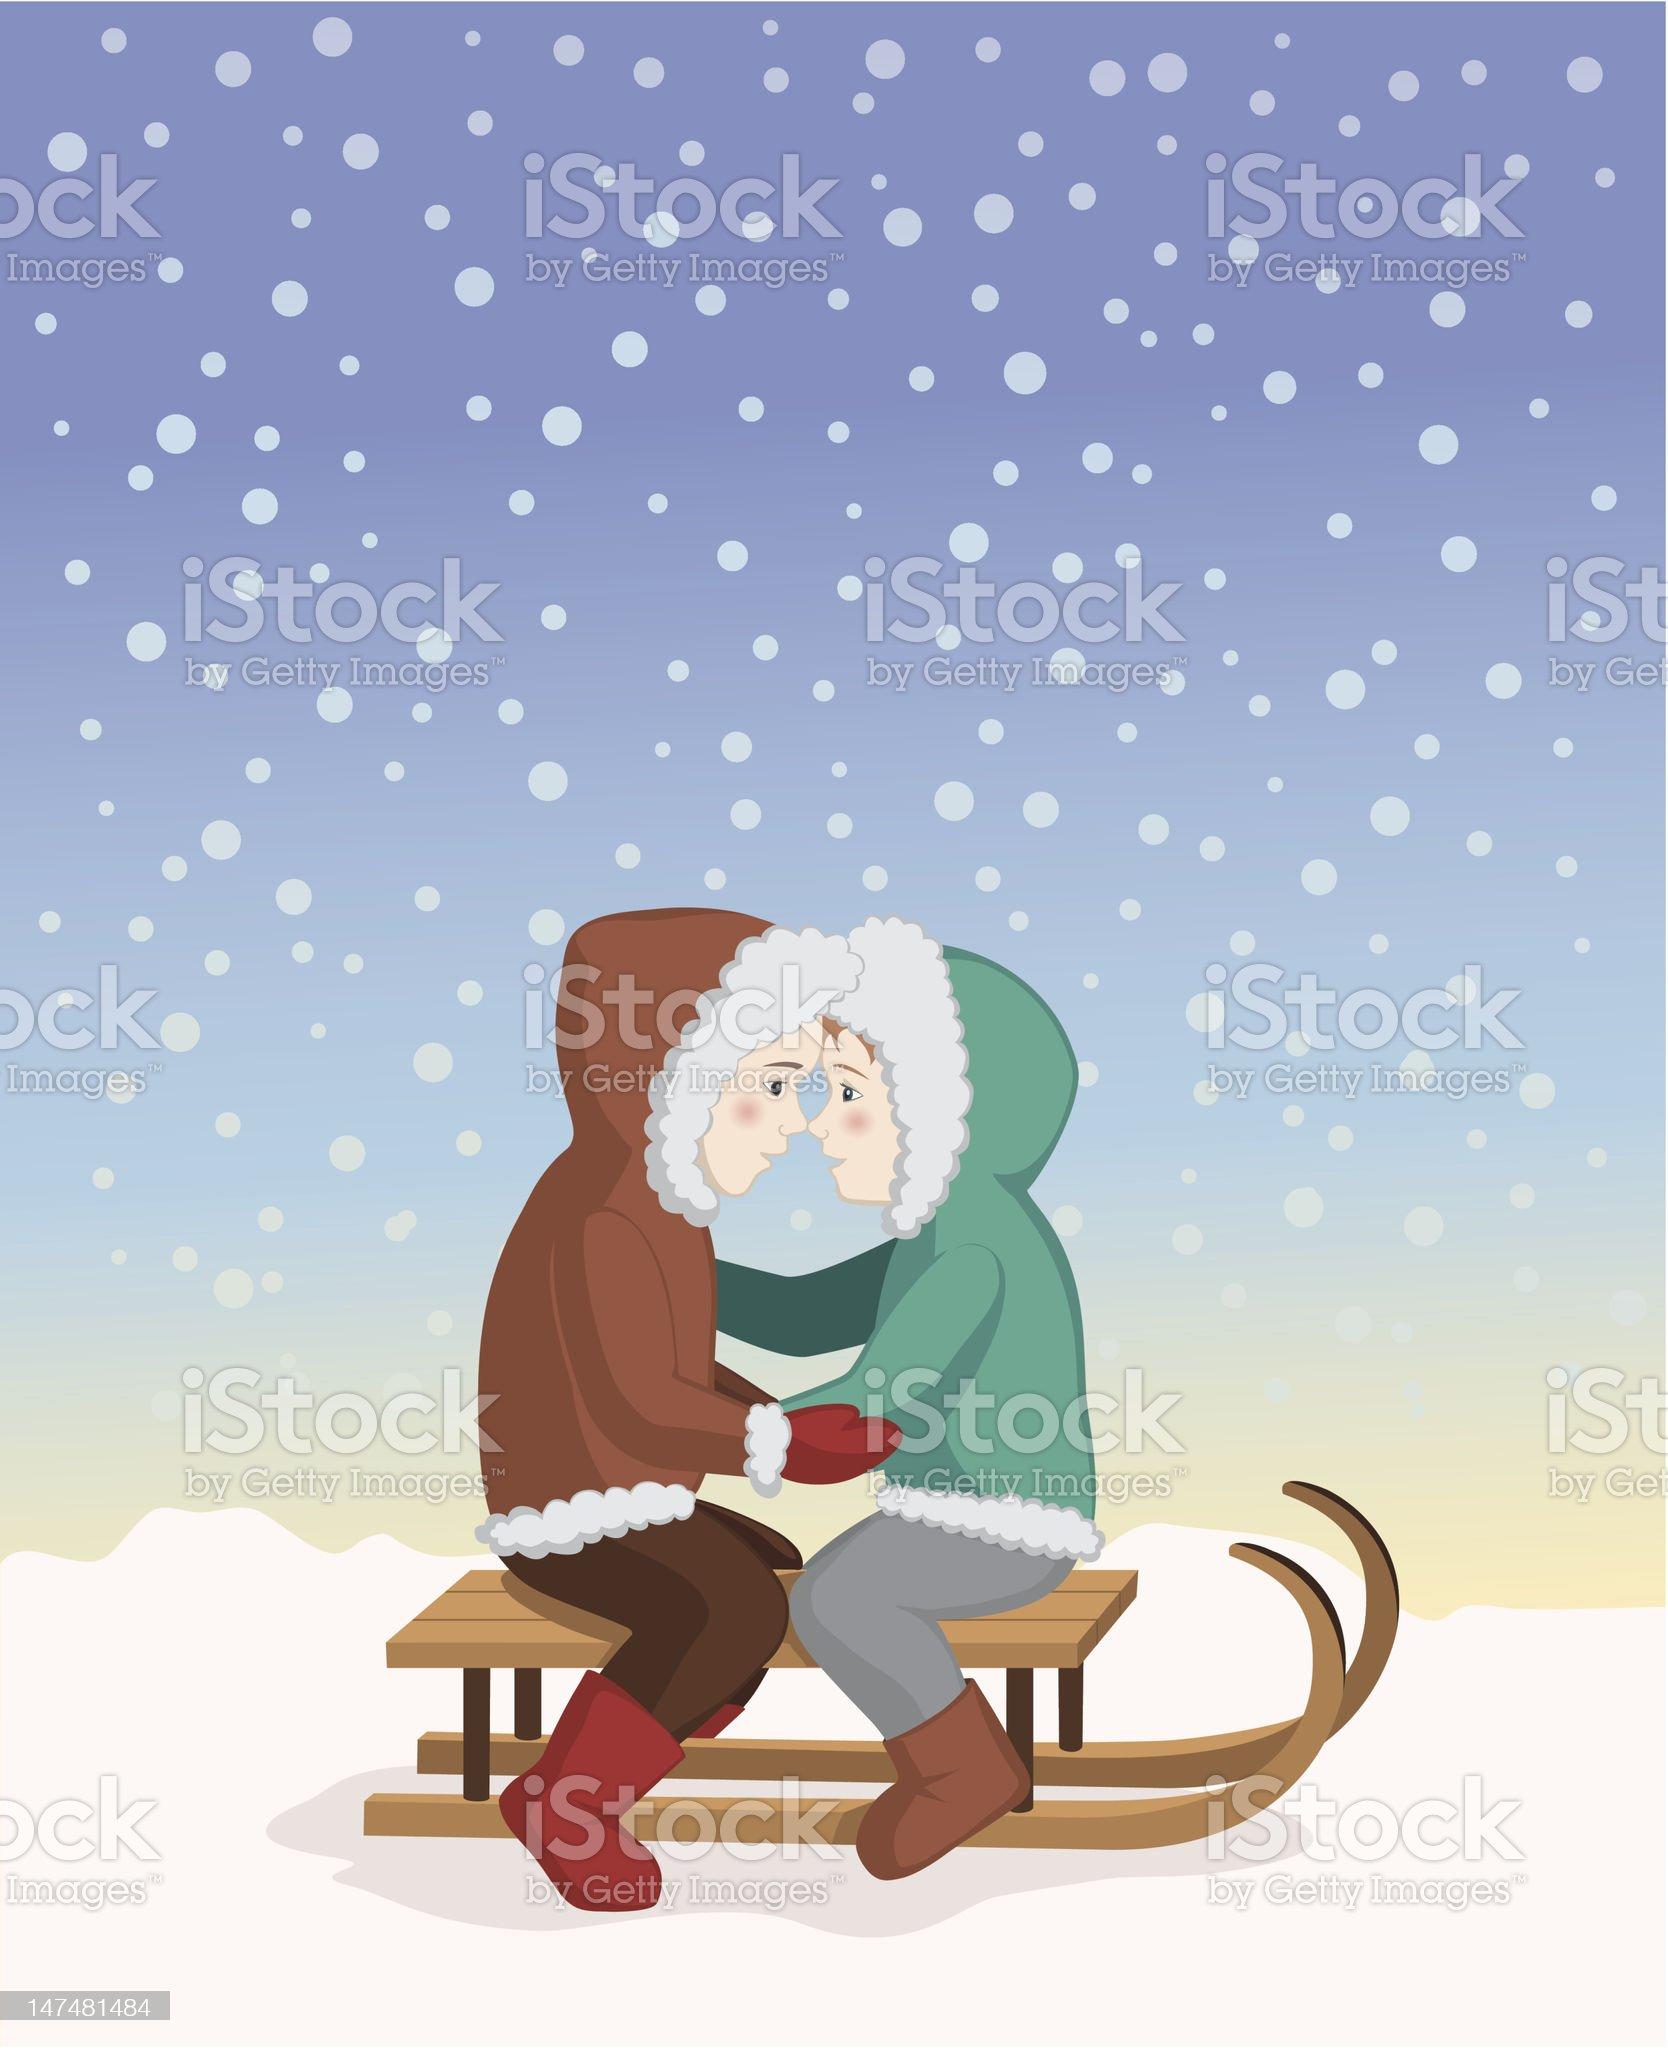 Eskimo kiss royalty-free stock vector art